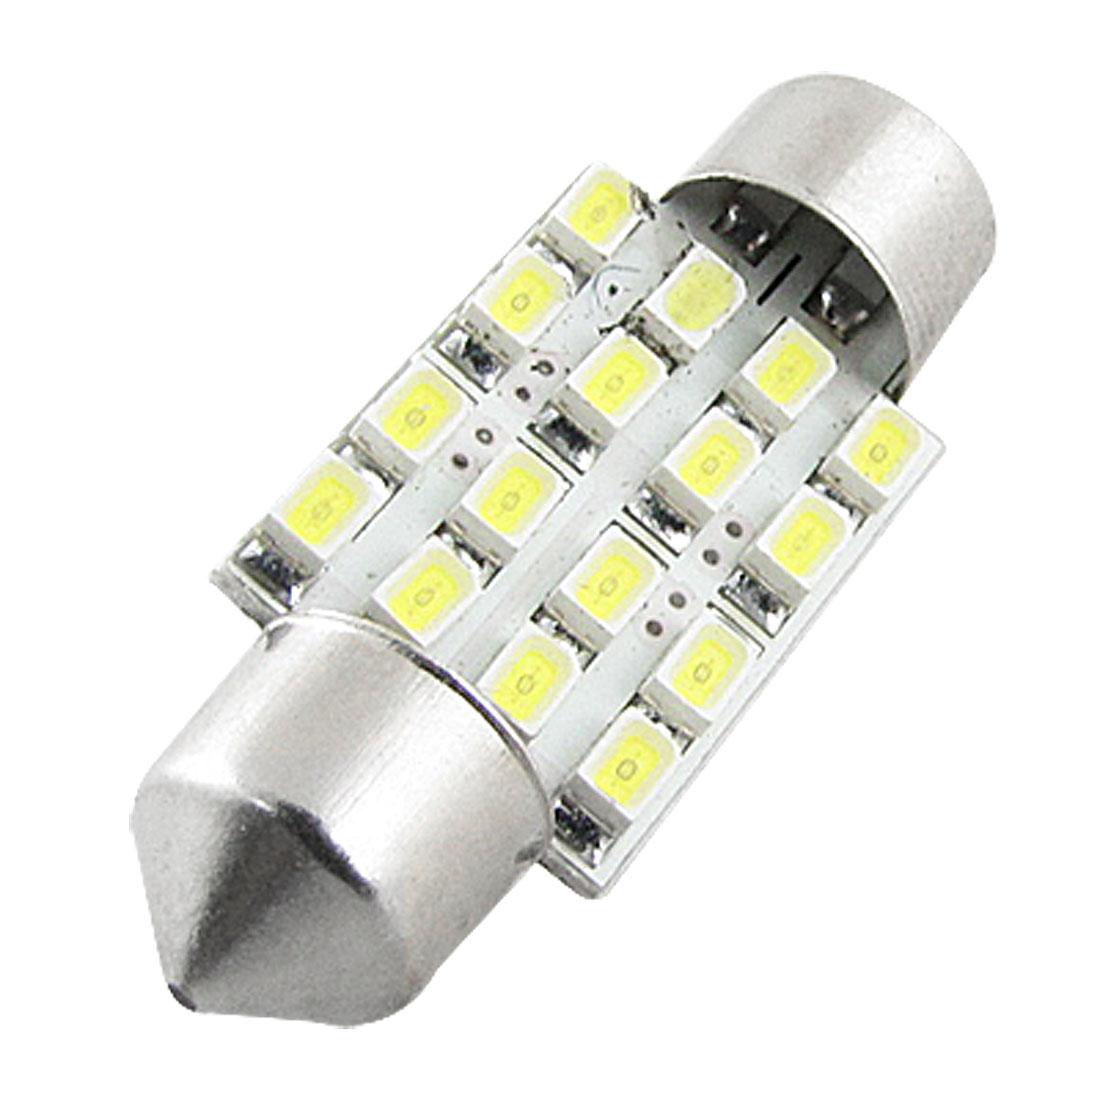 Auto Car 39mm White 1210 SMD 16 LED Interior Festoon Dome Map Light Bulb